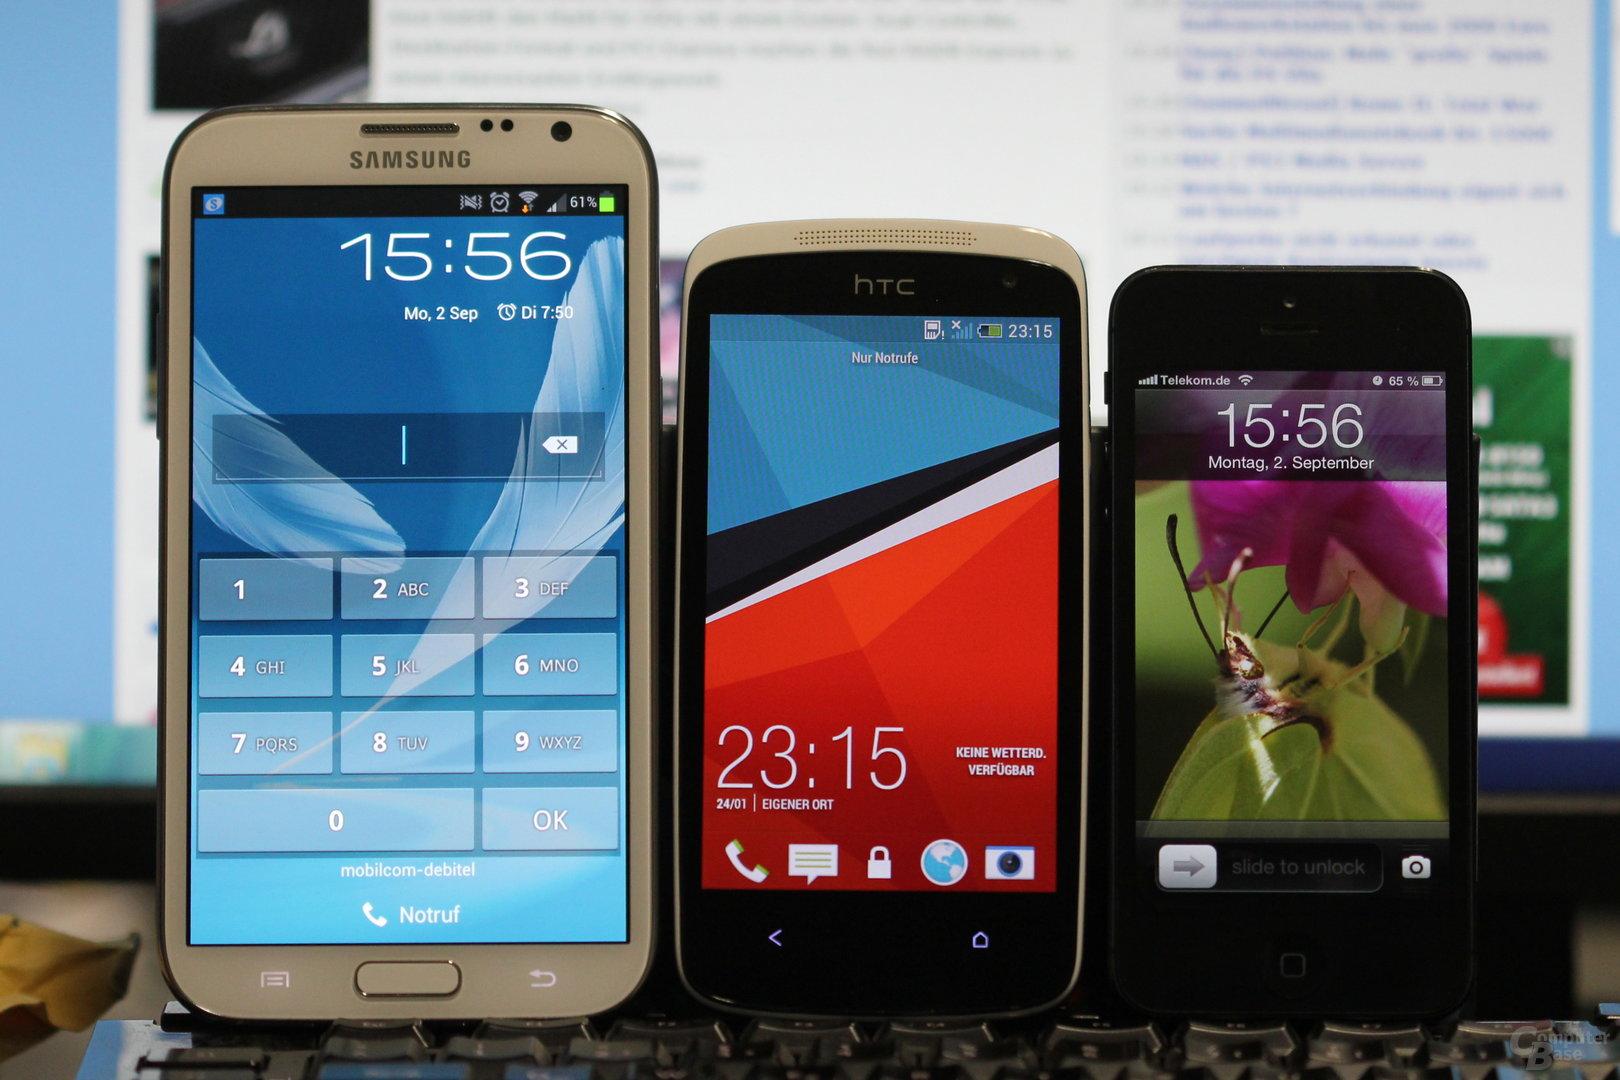 v.l.n.r.: Samsung Galaxy Note II, HTC Desire 500, iPhone 5